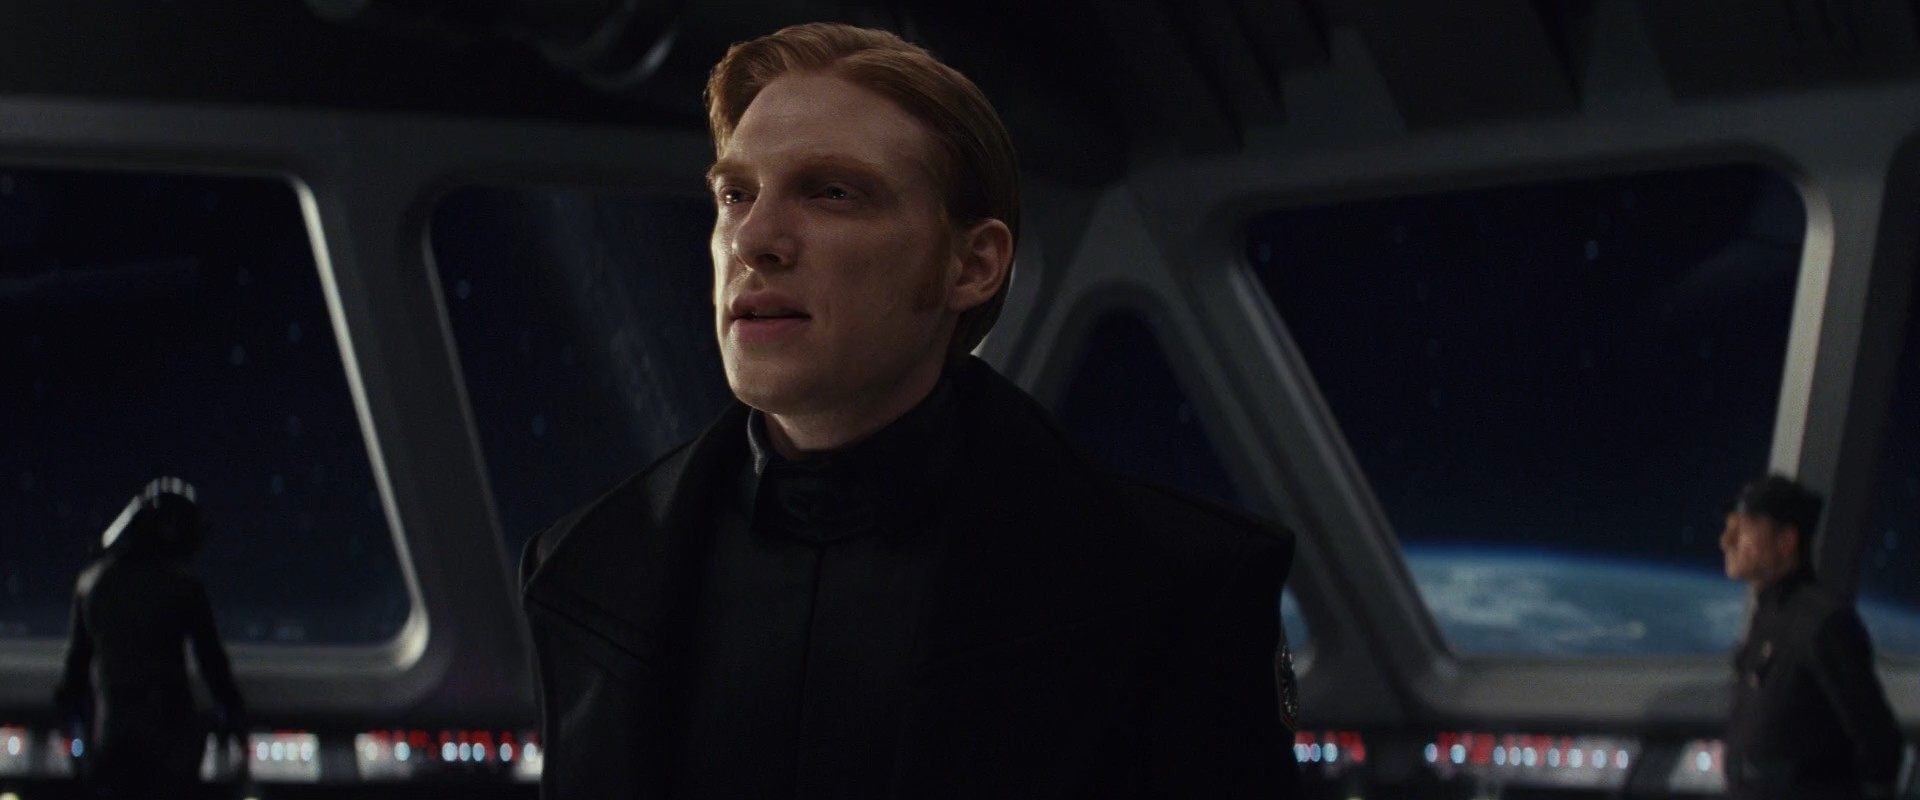 Star Wars: Son Jedi - Star Wars: Episode VIII - The Last Jedi - 2017 - m1080p BluRay x264 - DuaL TR-EN